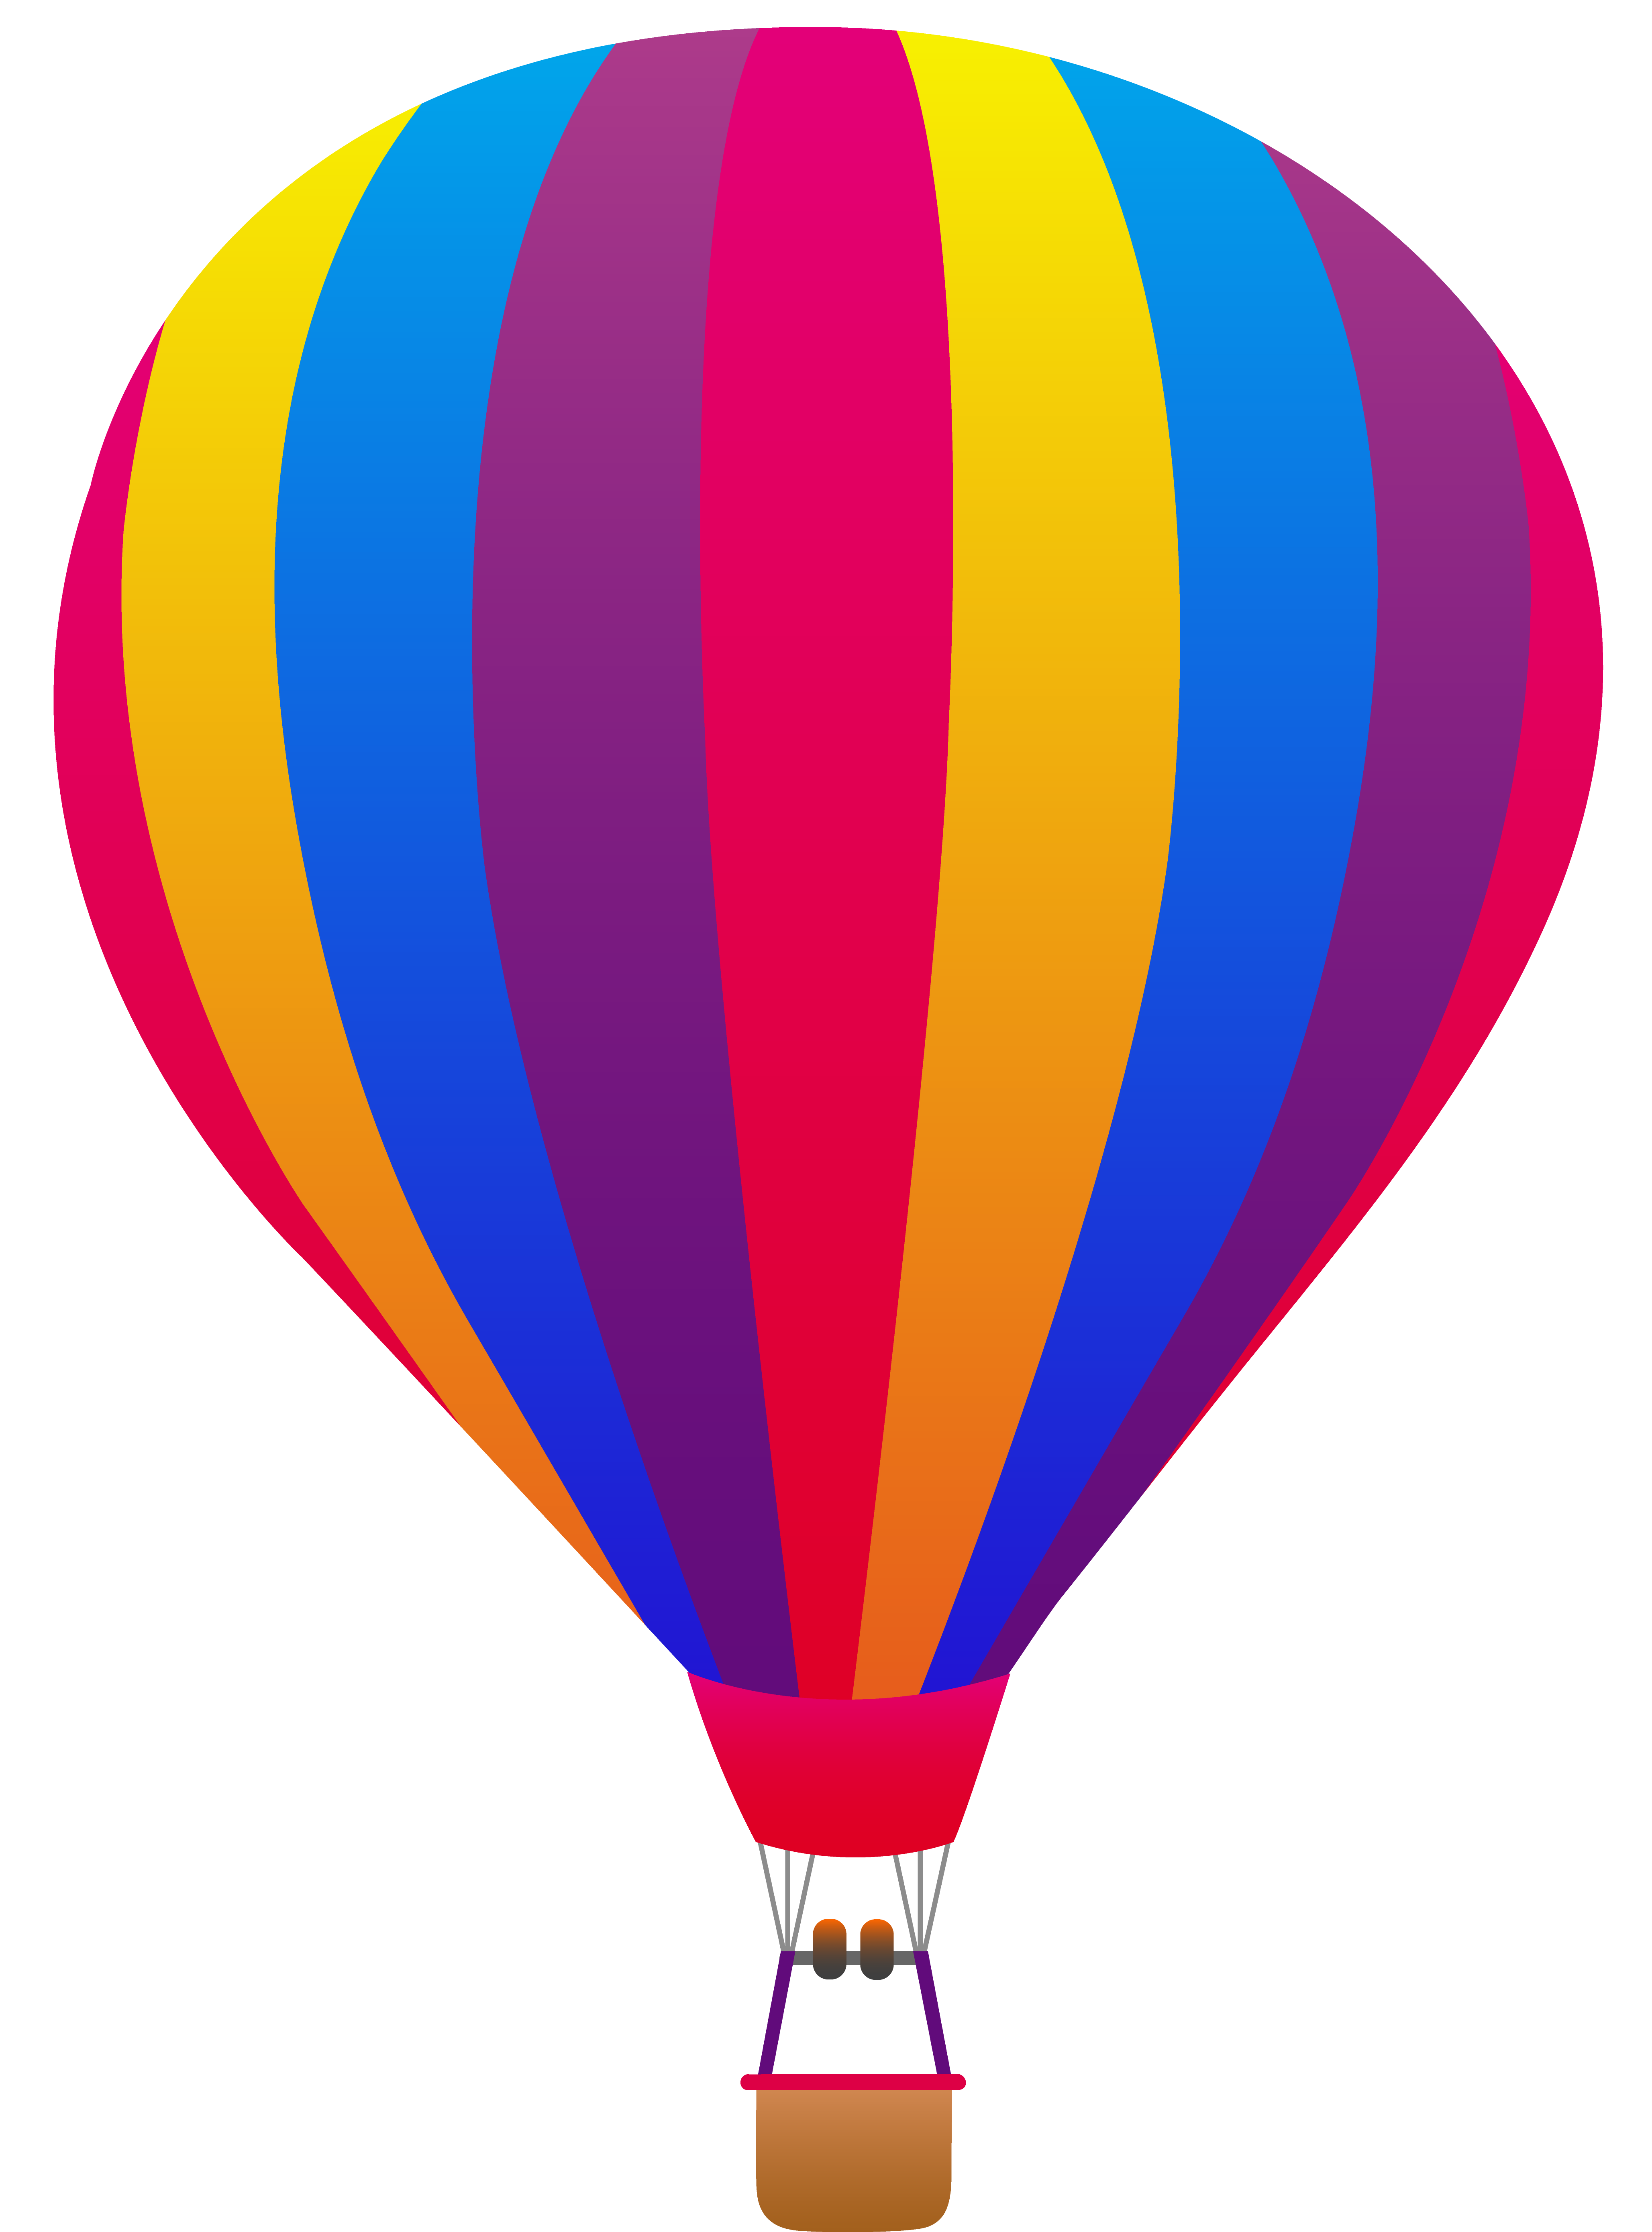 Free Hot Air Balloon Clipart, Download Free Clip Art, Free.